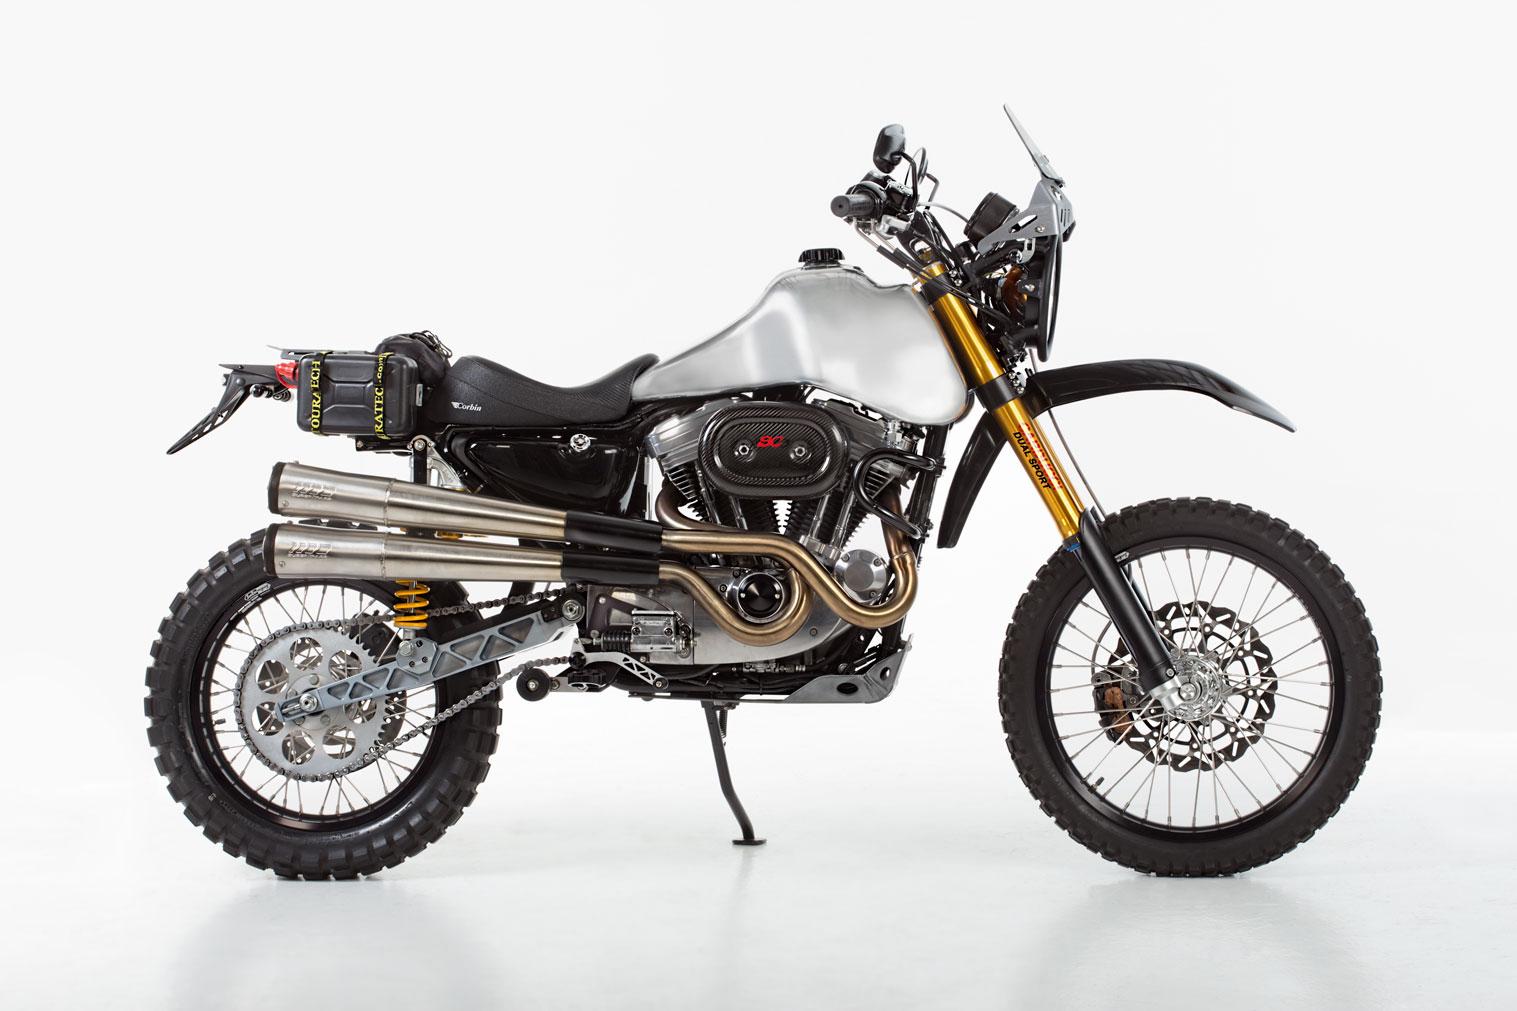 Carducci Dualsport Custom Harley-Davidson Motorcycle